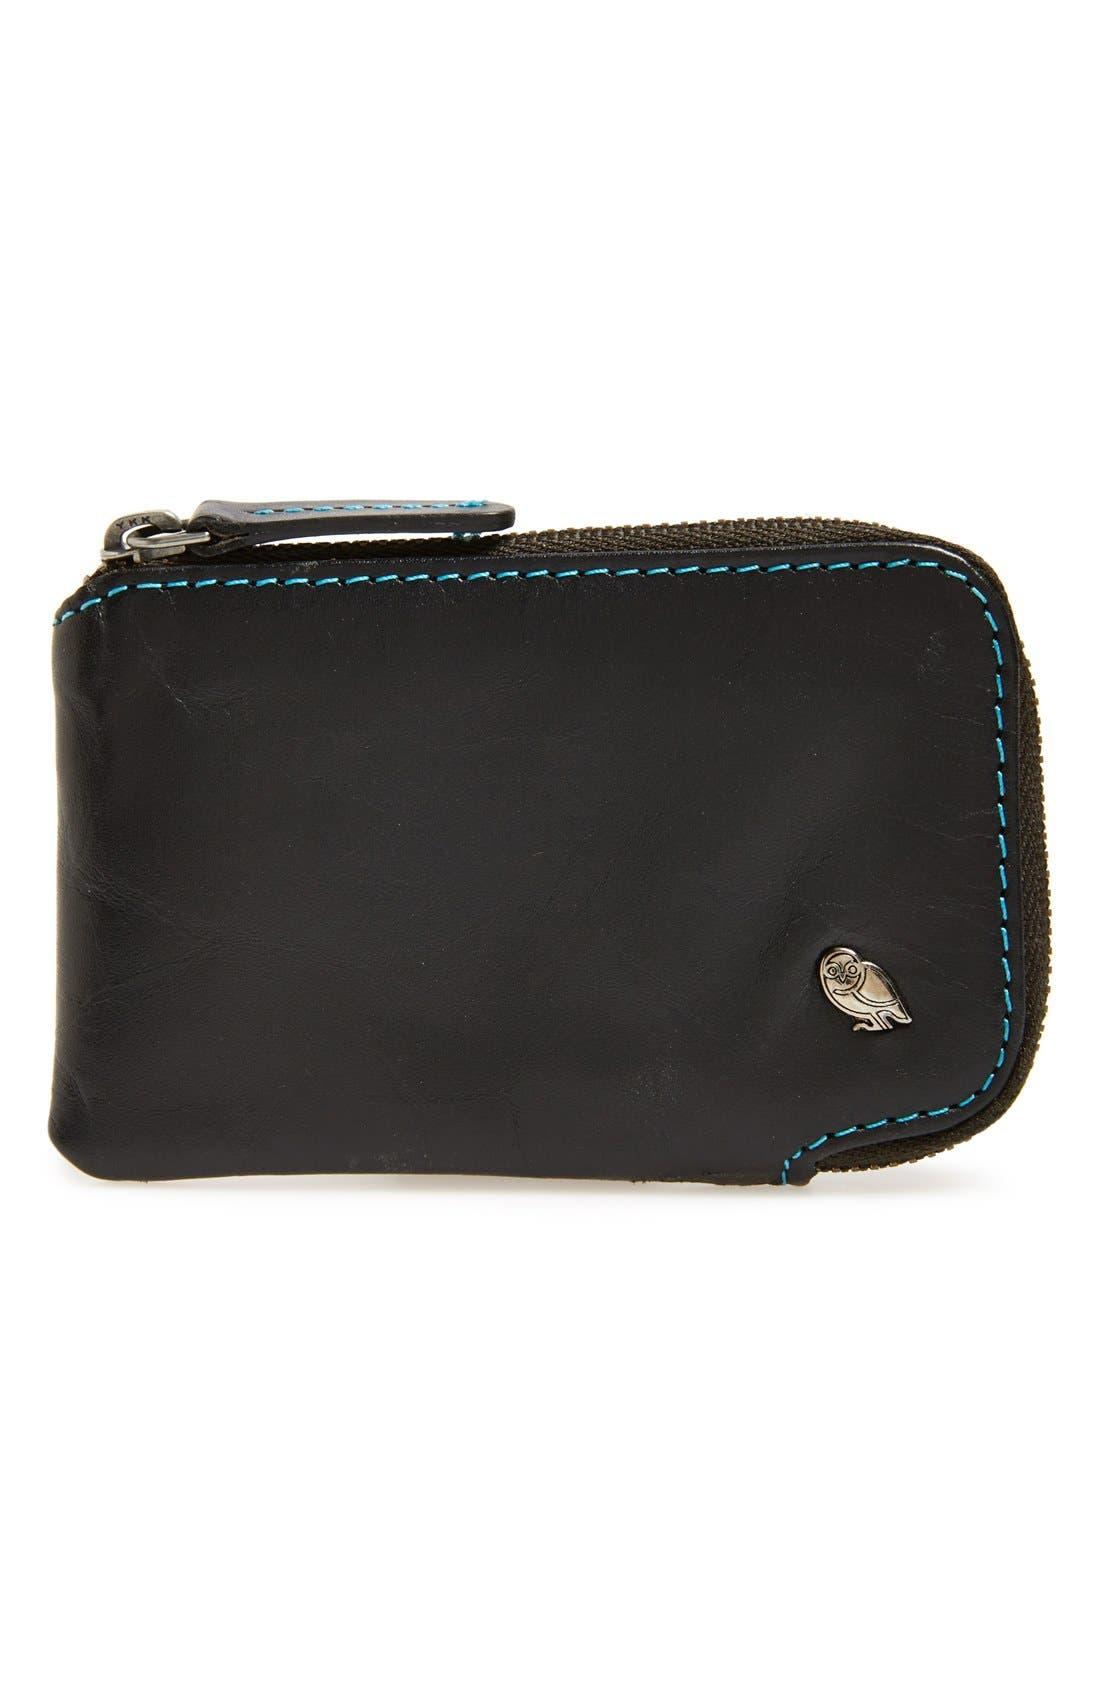 BELLROY,                             'Very Small' Wallet,                             Main thumbnail 1, color,                             001